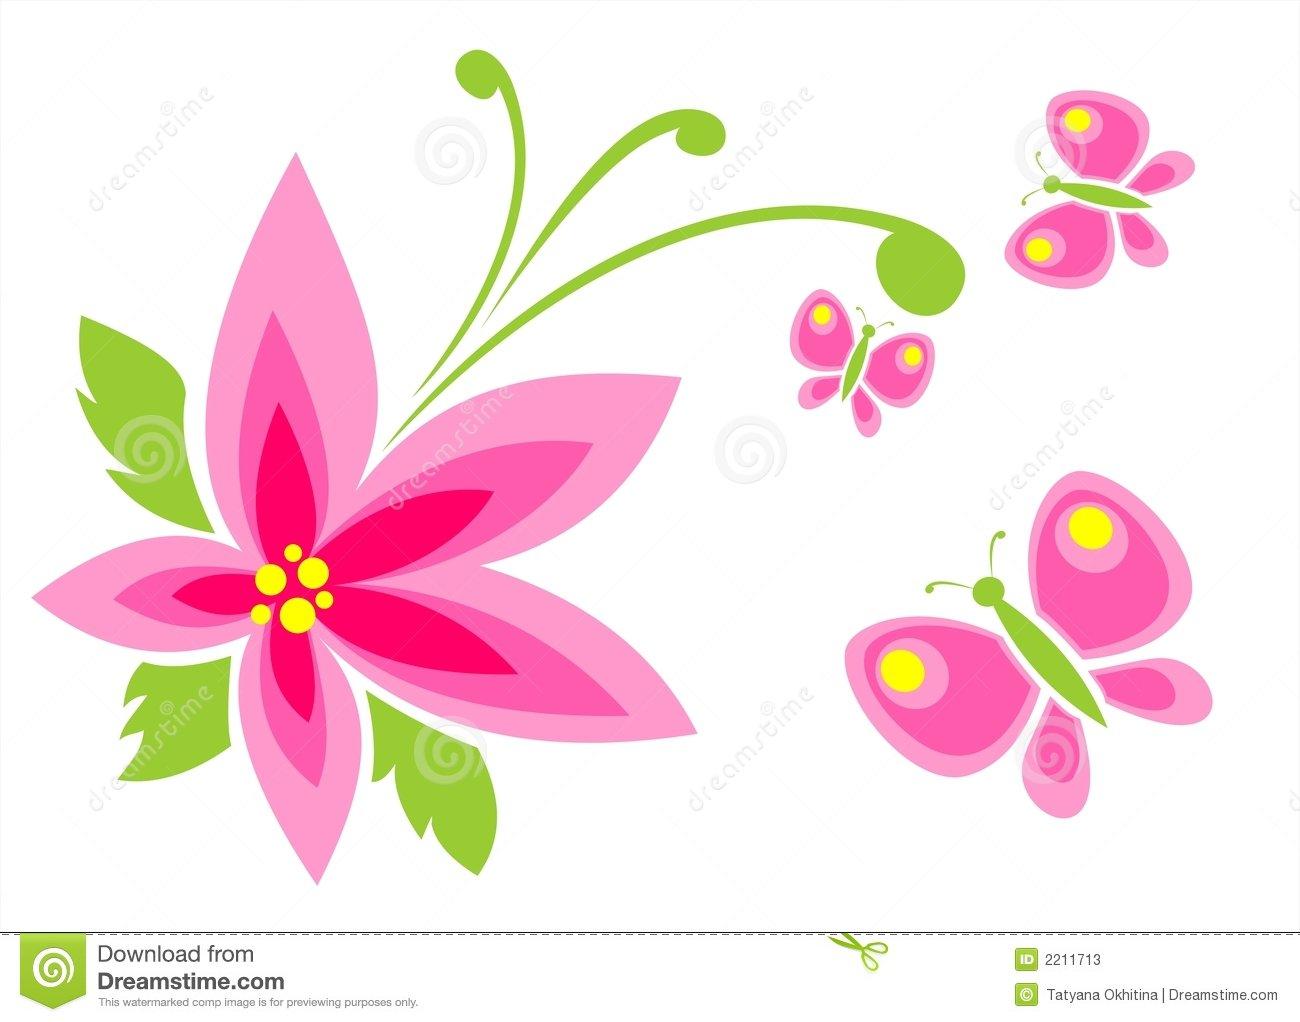 Flores En 3d Related Keywords & Suggestions